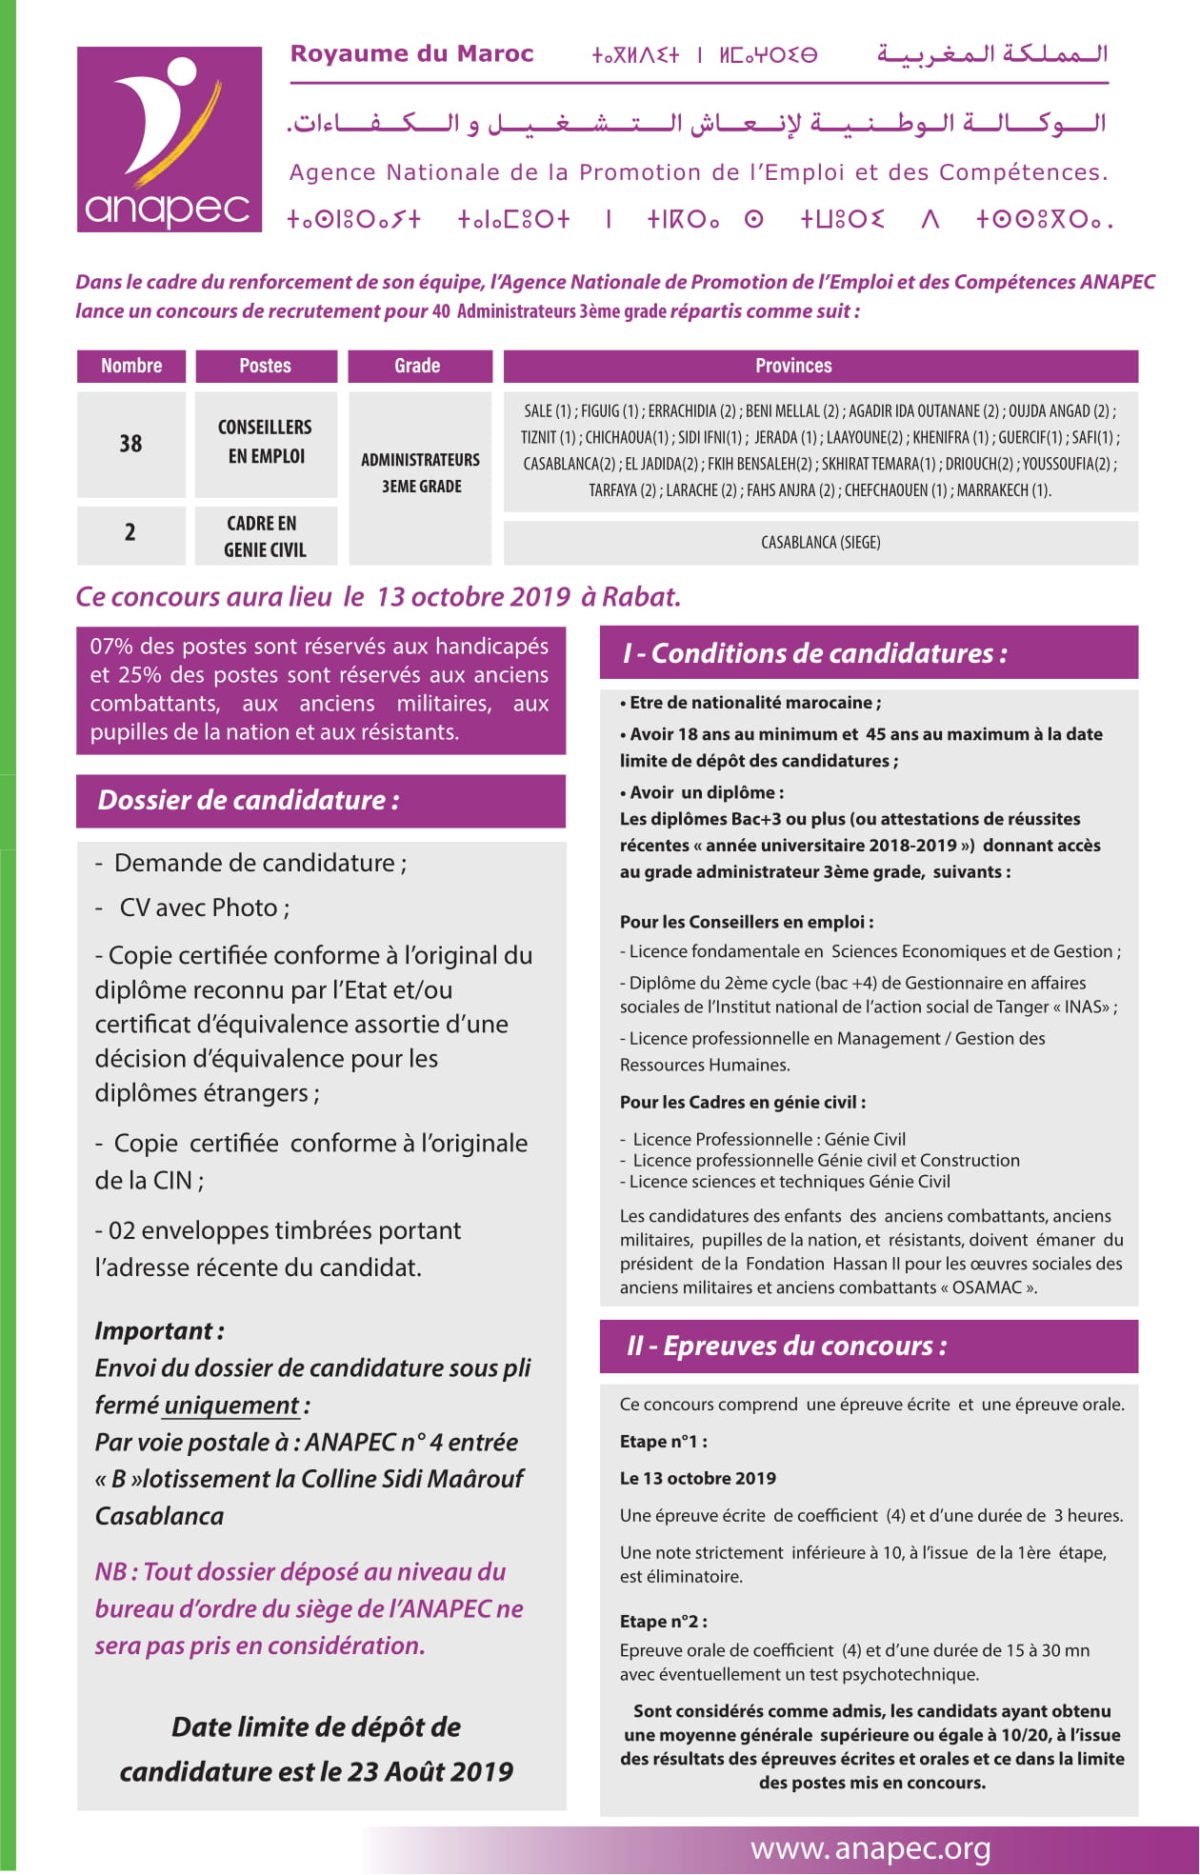 Annonceconseillers2019 1 Concours ANAPEC (40 Postes)